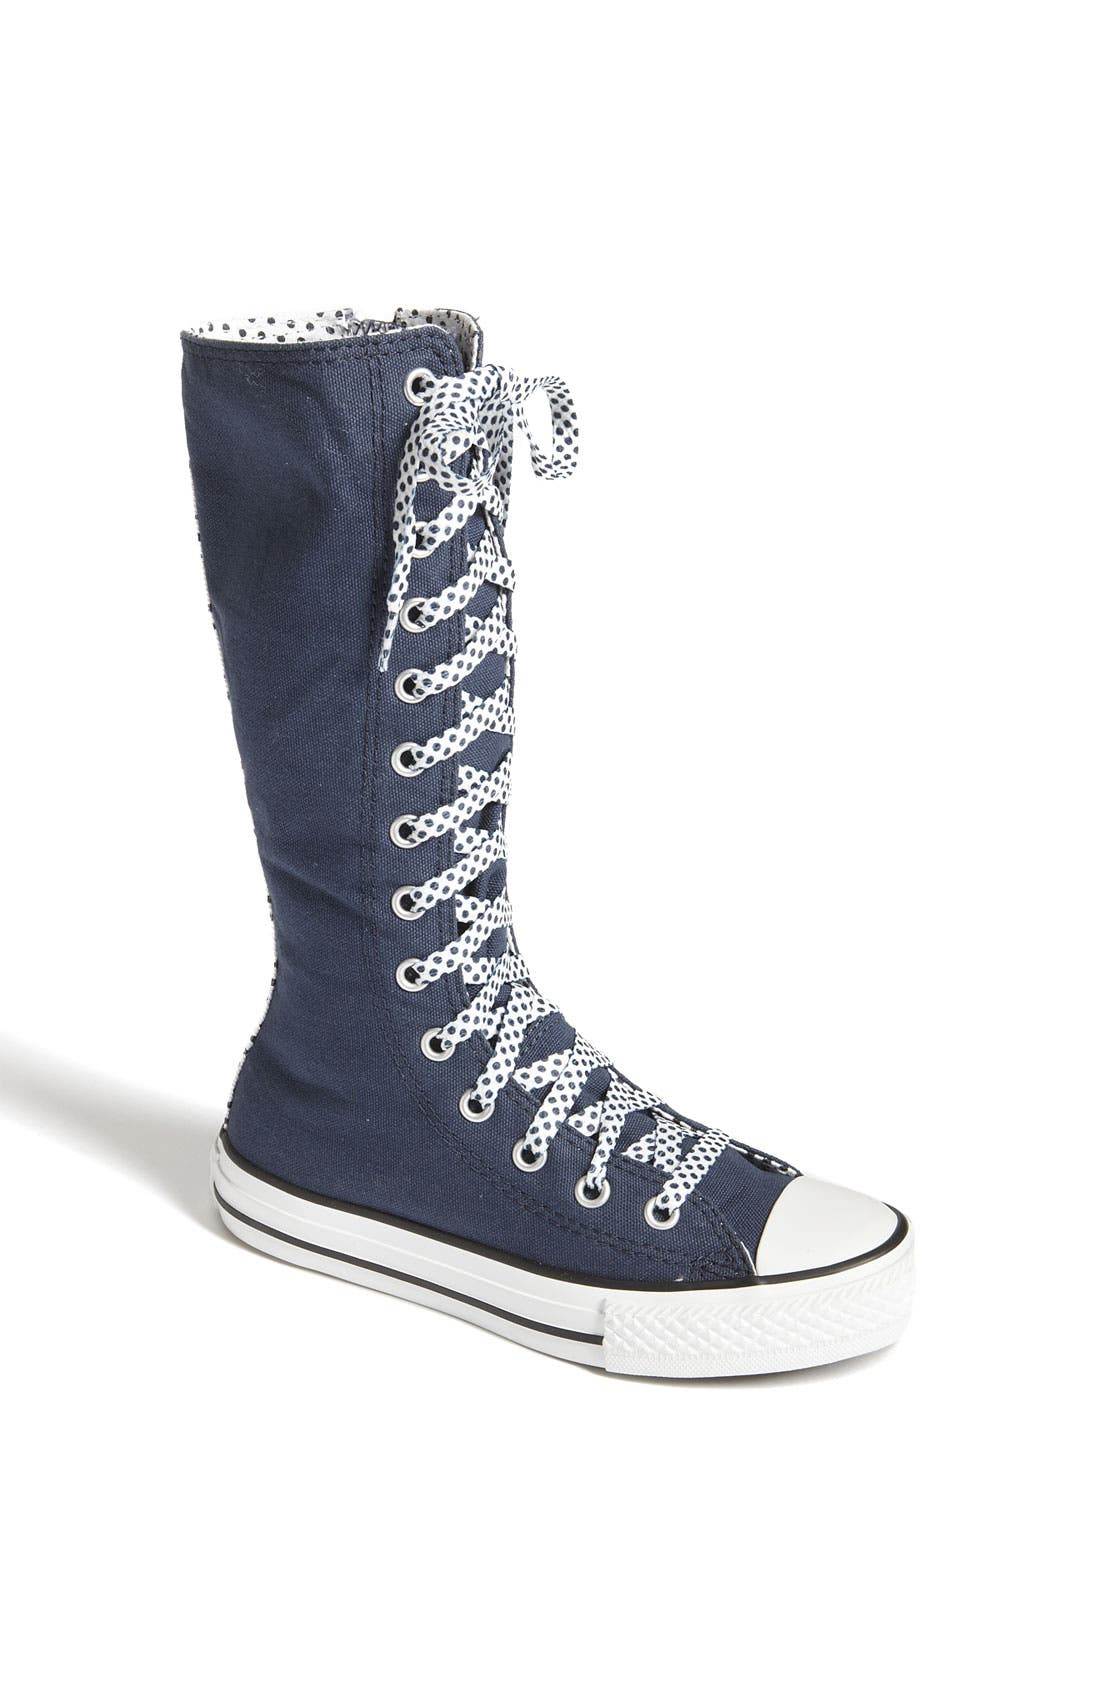 Main Image - Converse Chuck Taylor® 'X-Hi' Sneaker (Toddler, Little Kid & Big Kid)